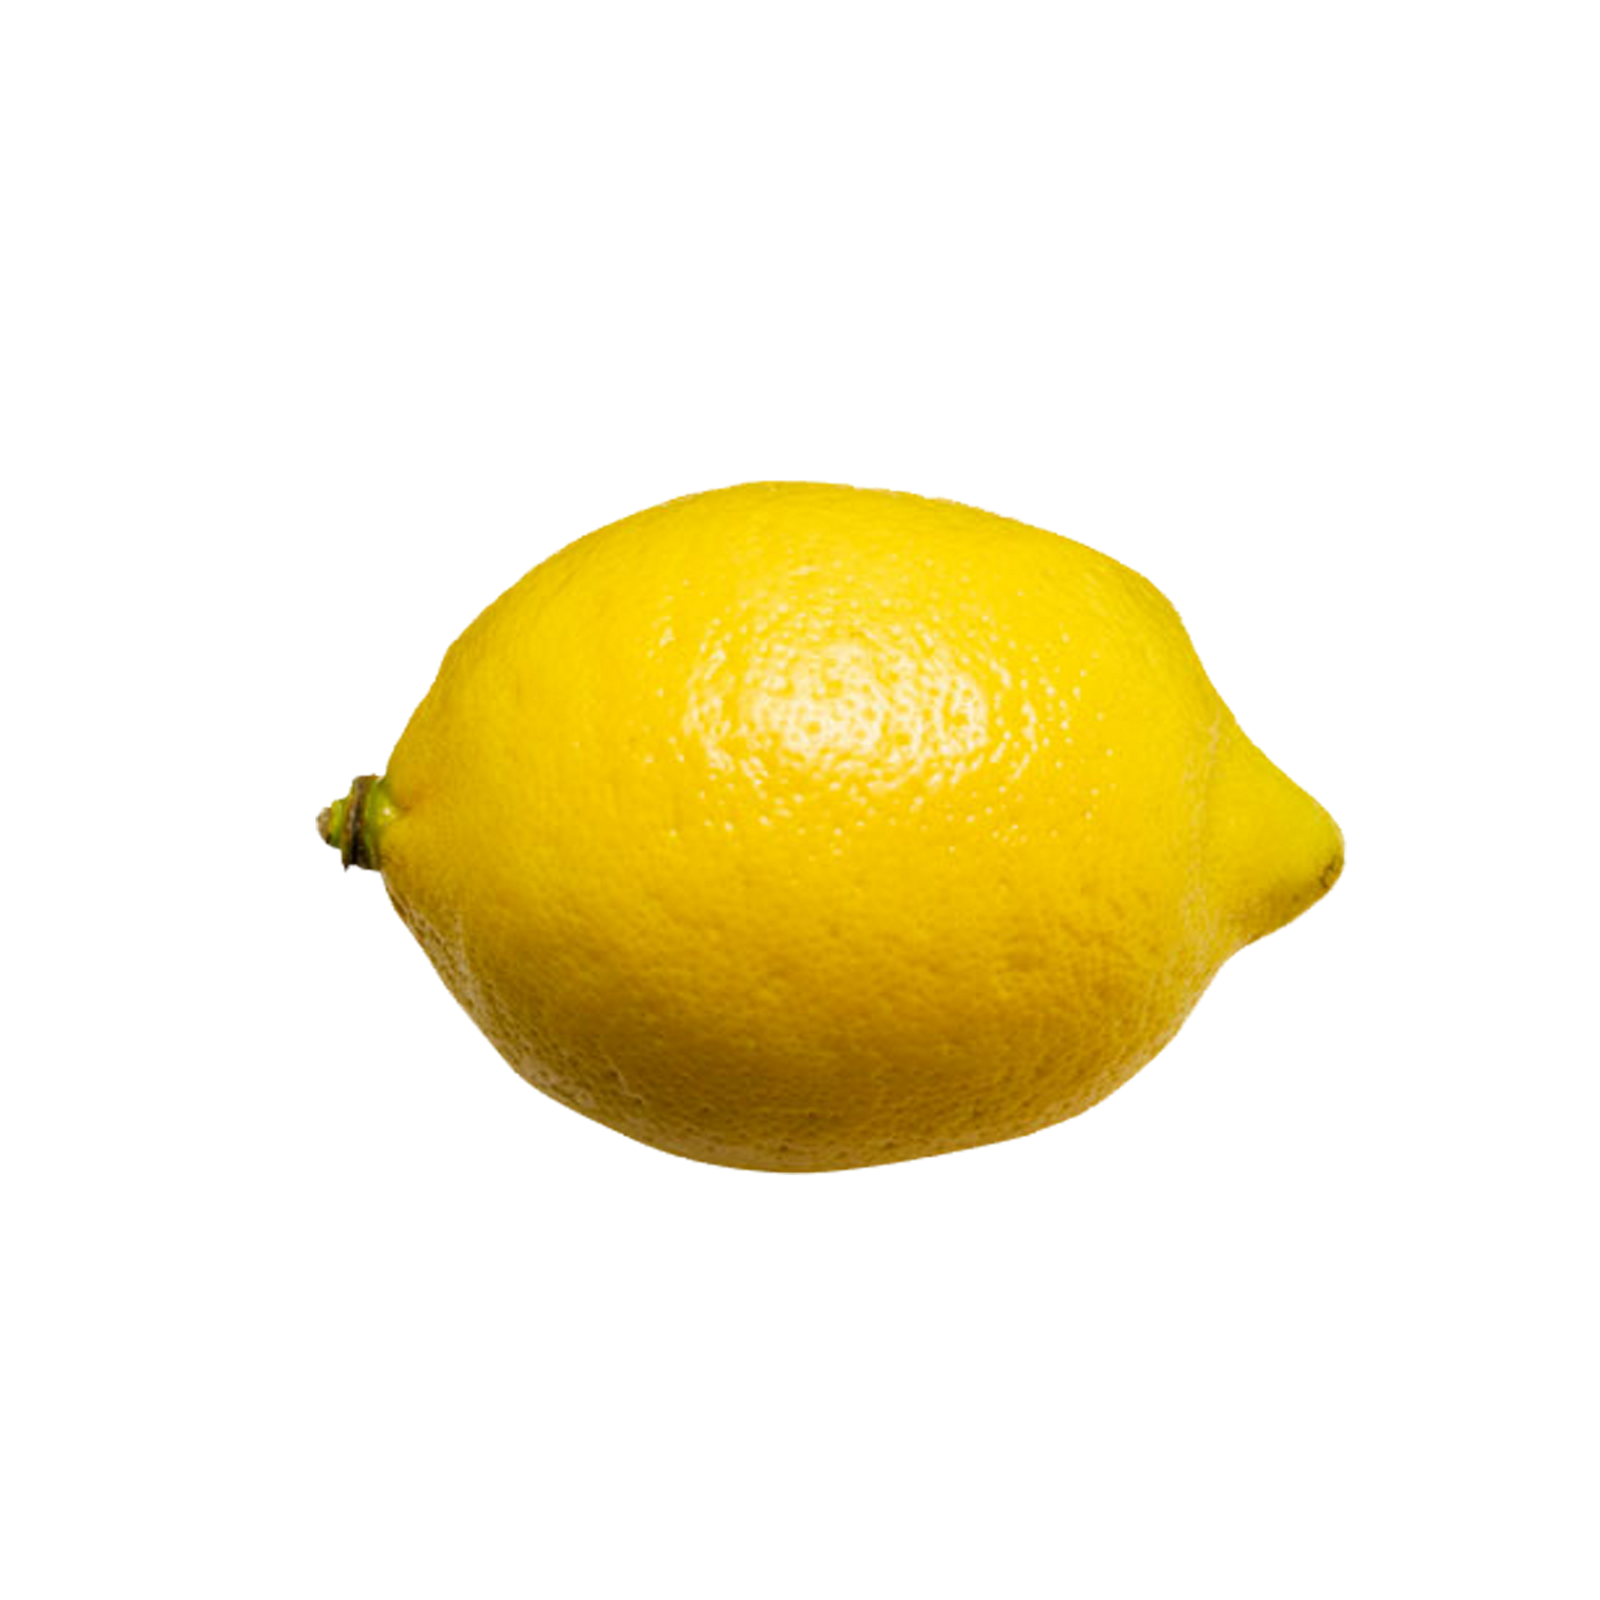 Lemons clipart fruit single, Lemons fruit single Transparent